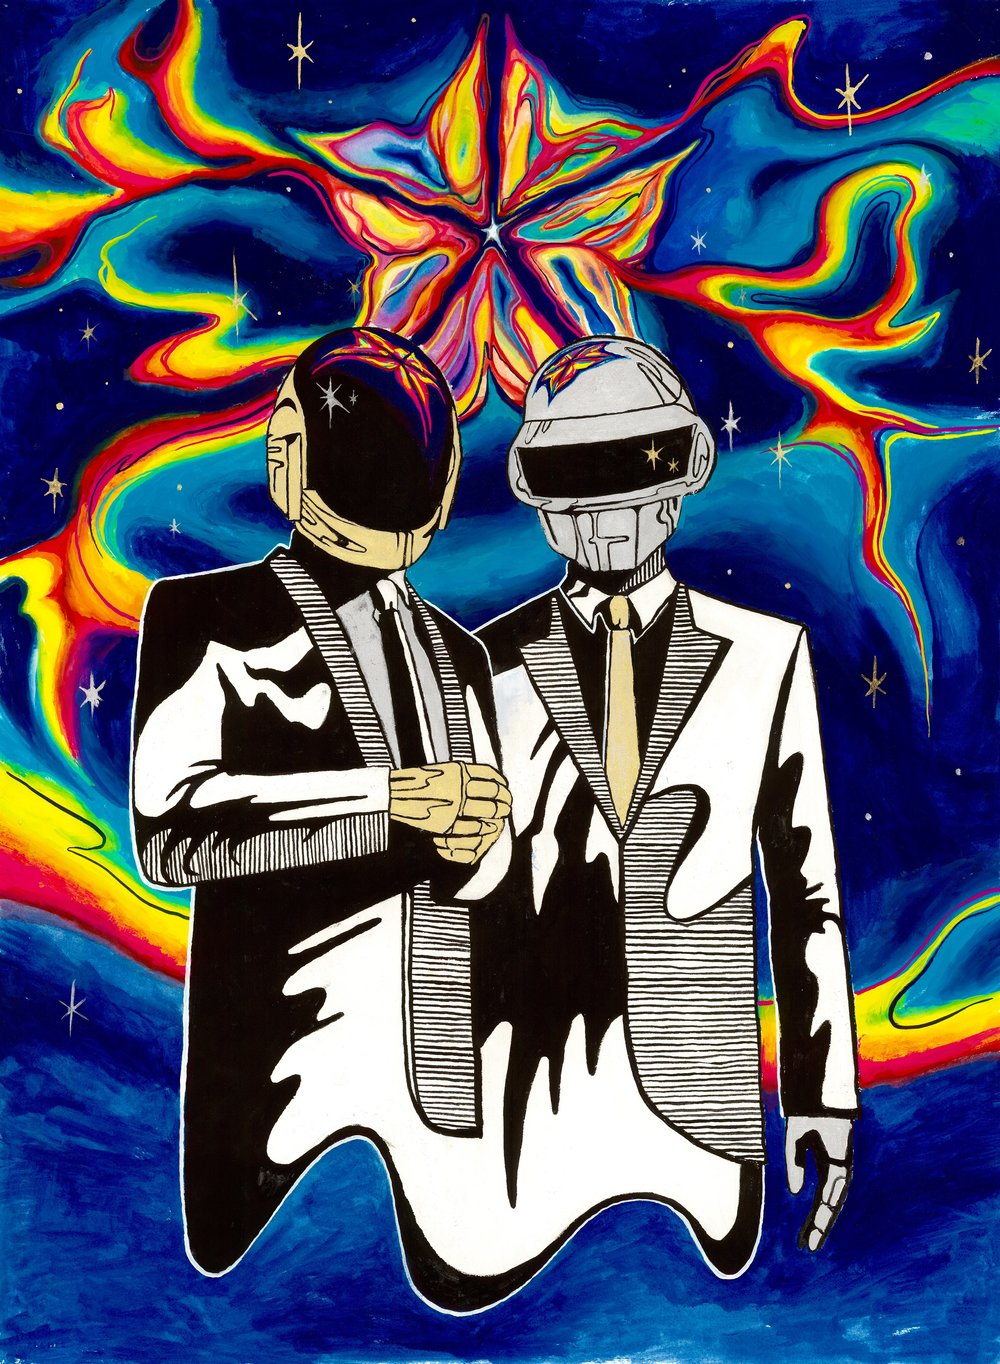 Daft Punk 2017, watercolor, gouache & metalic paint